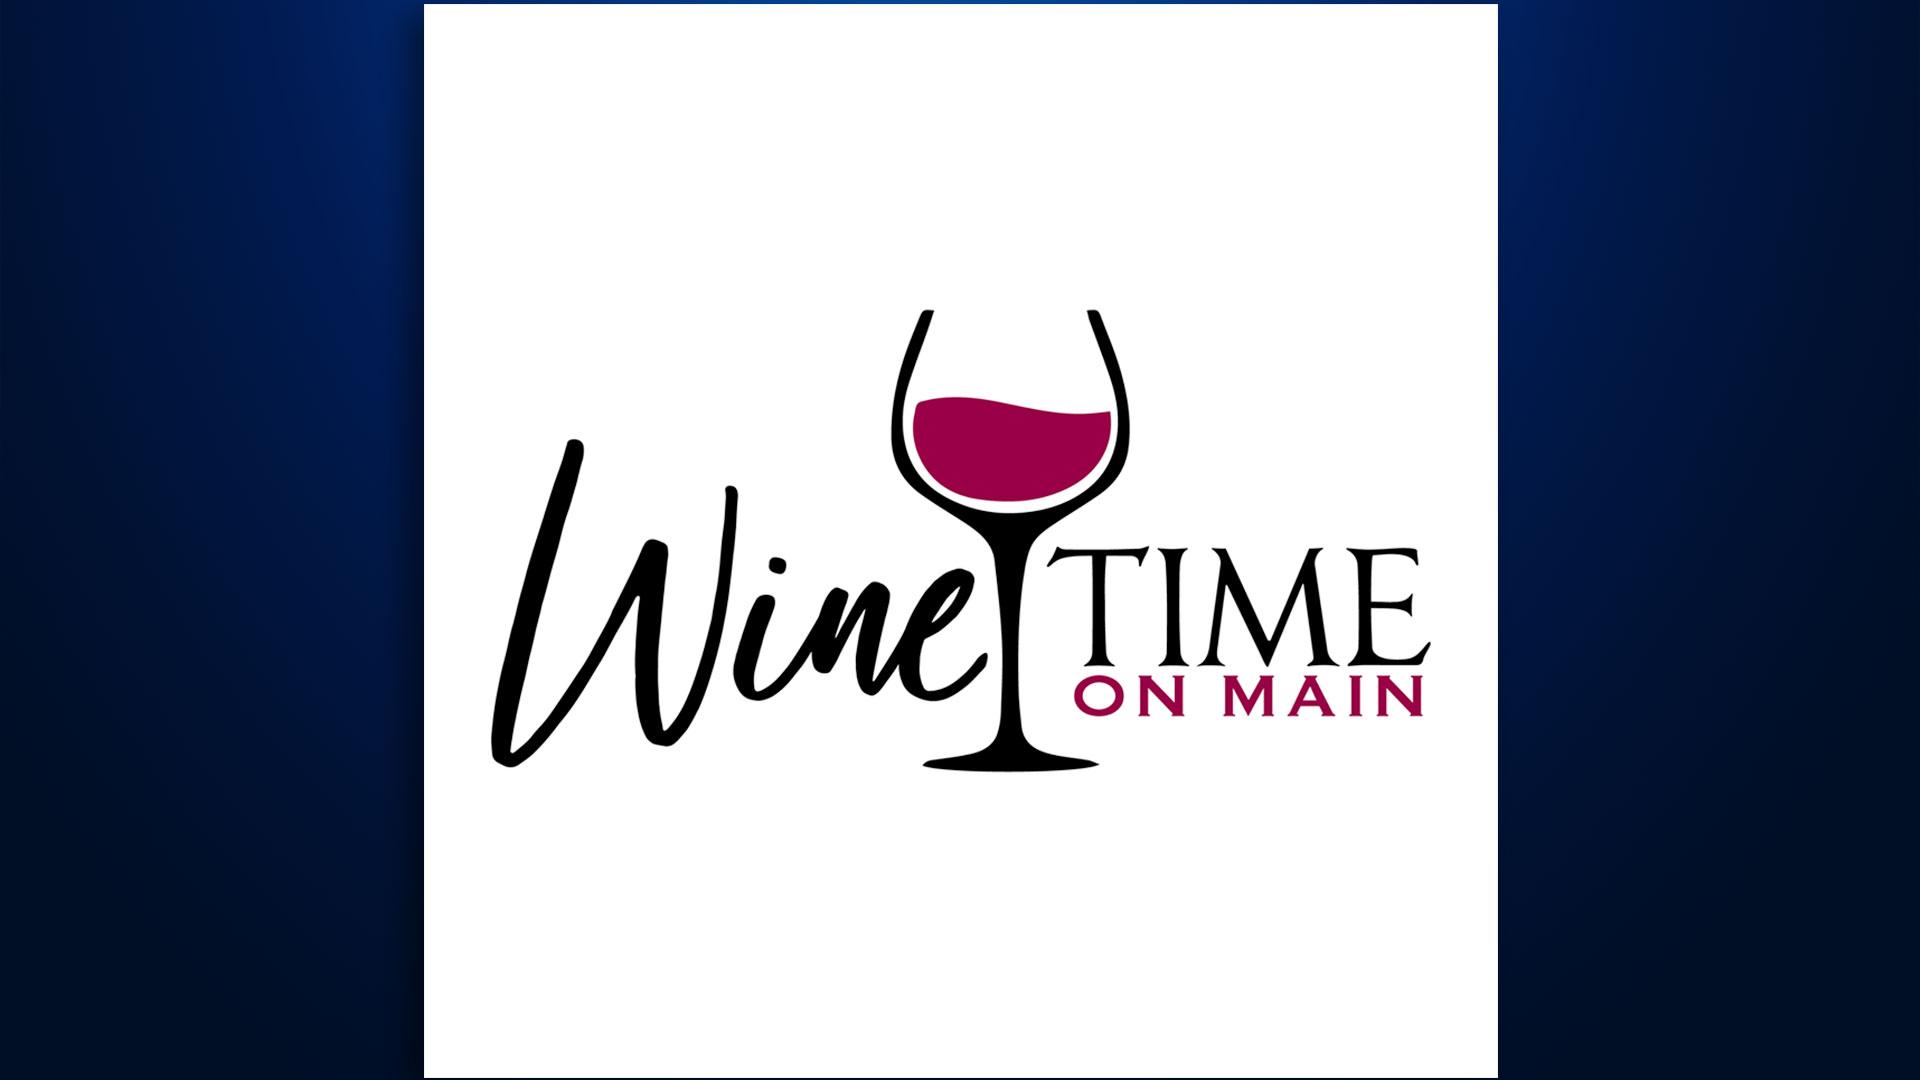 KELO Wine Time On Main